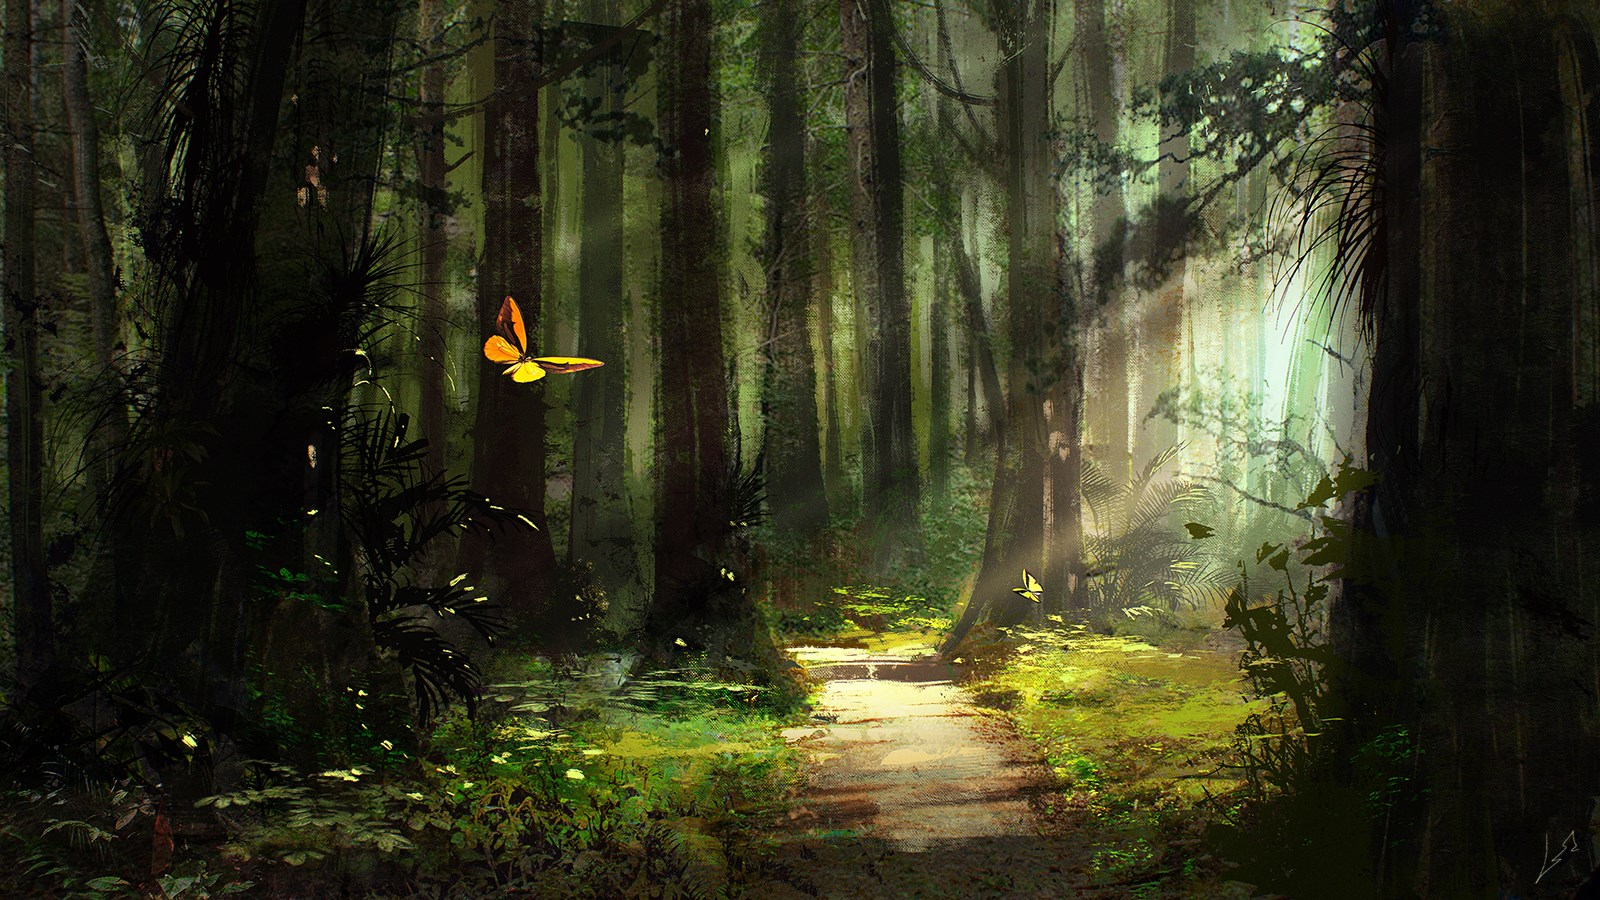 при картинки фэнтези лес тропинка также предполагают, что